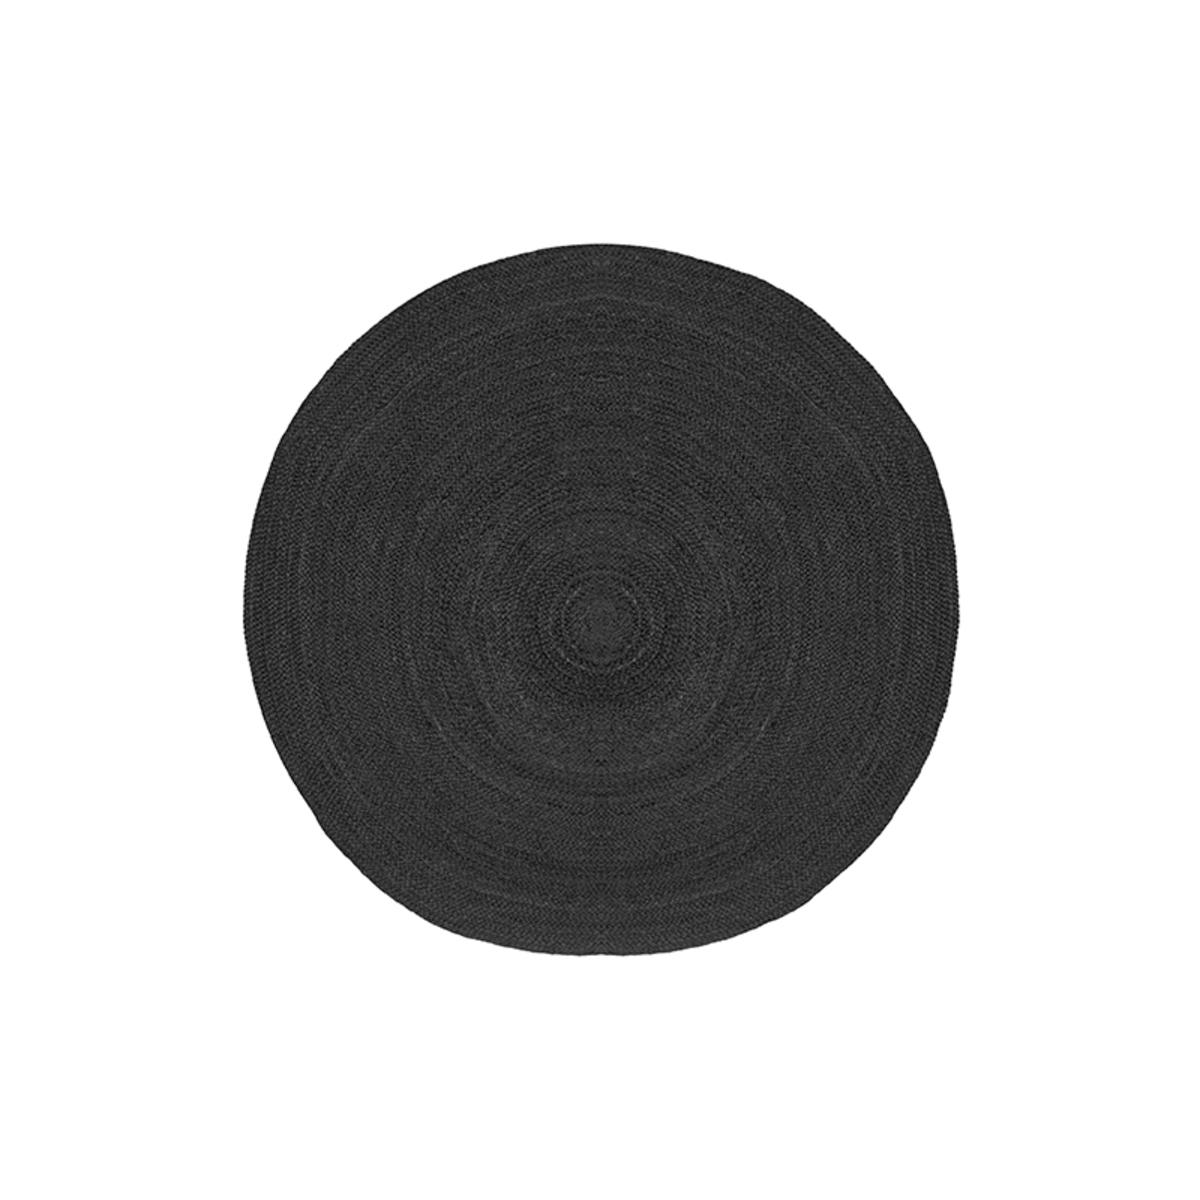 Vloerkleed Jute - Zwart - Jute - 90 cm